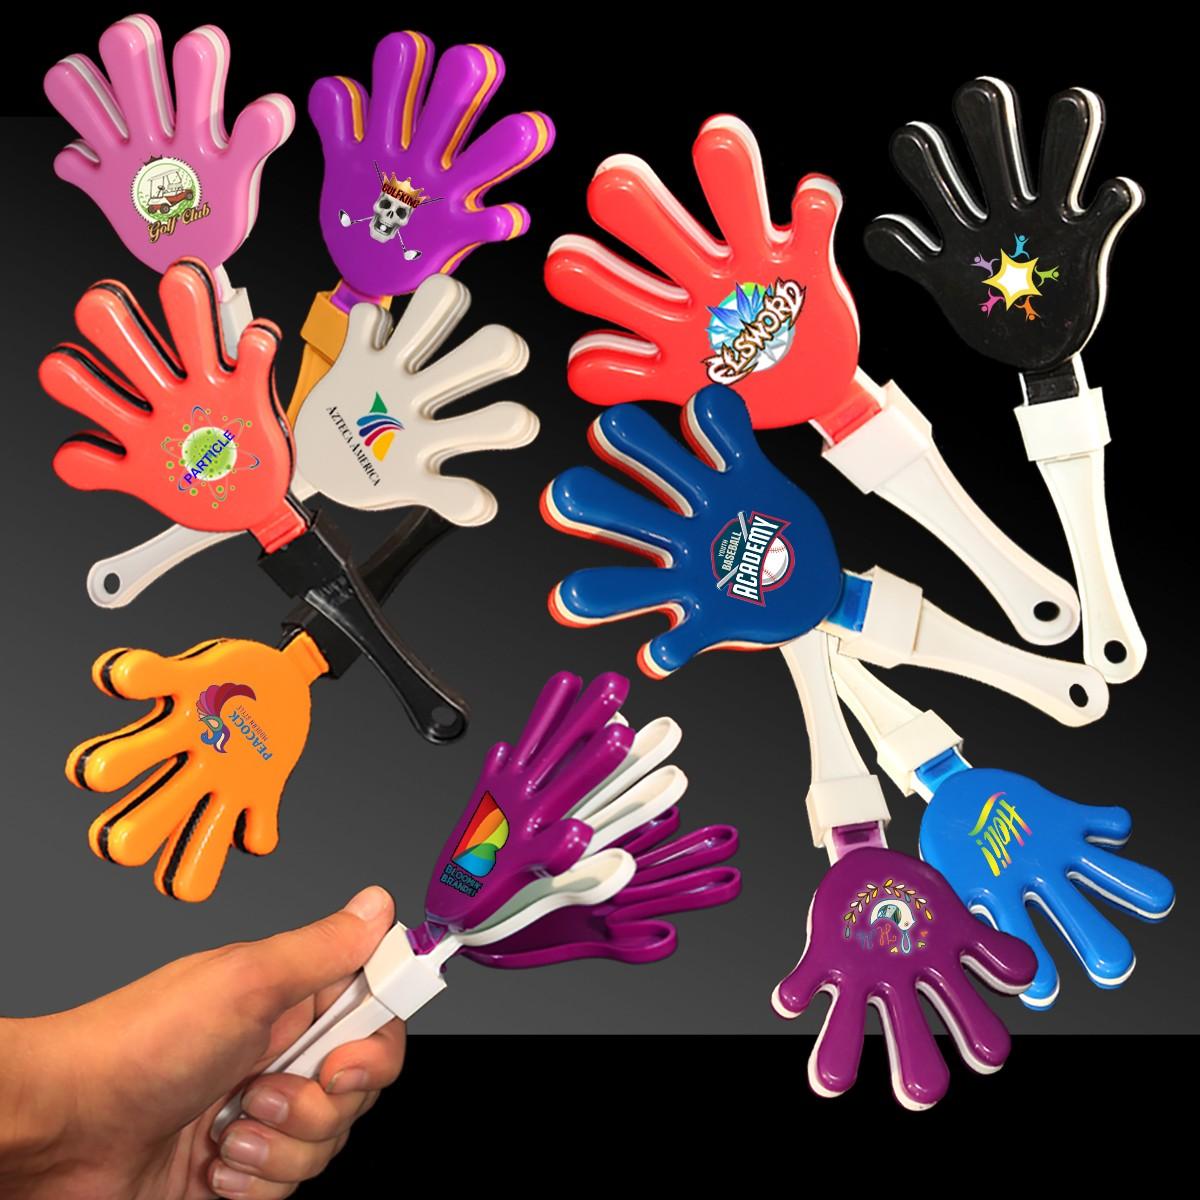 REDBLACKRED HAND CLAPPER